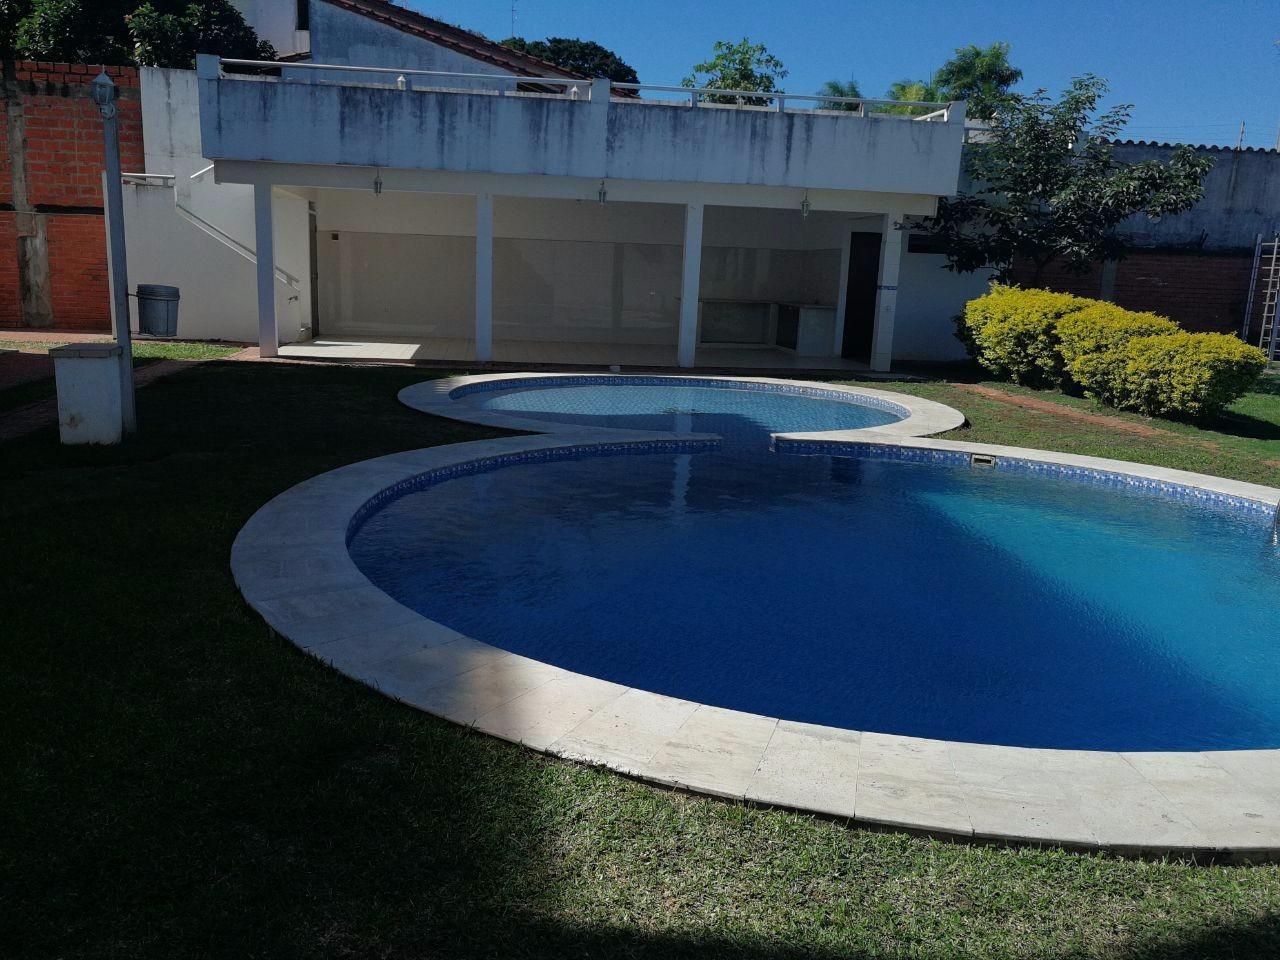 Casa en Alquiler Zona norte; 4to anillo entre av banzer y av. Beni Foto 1